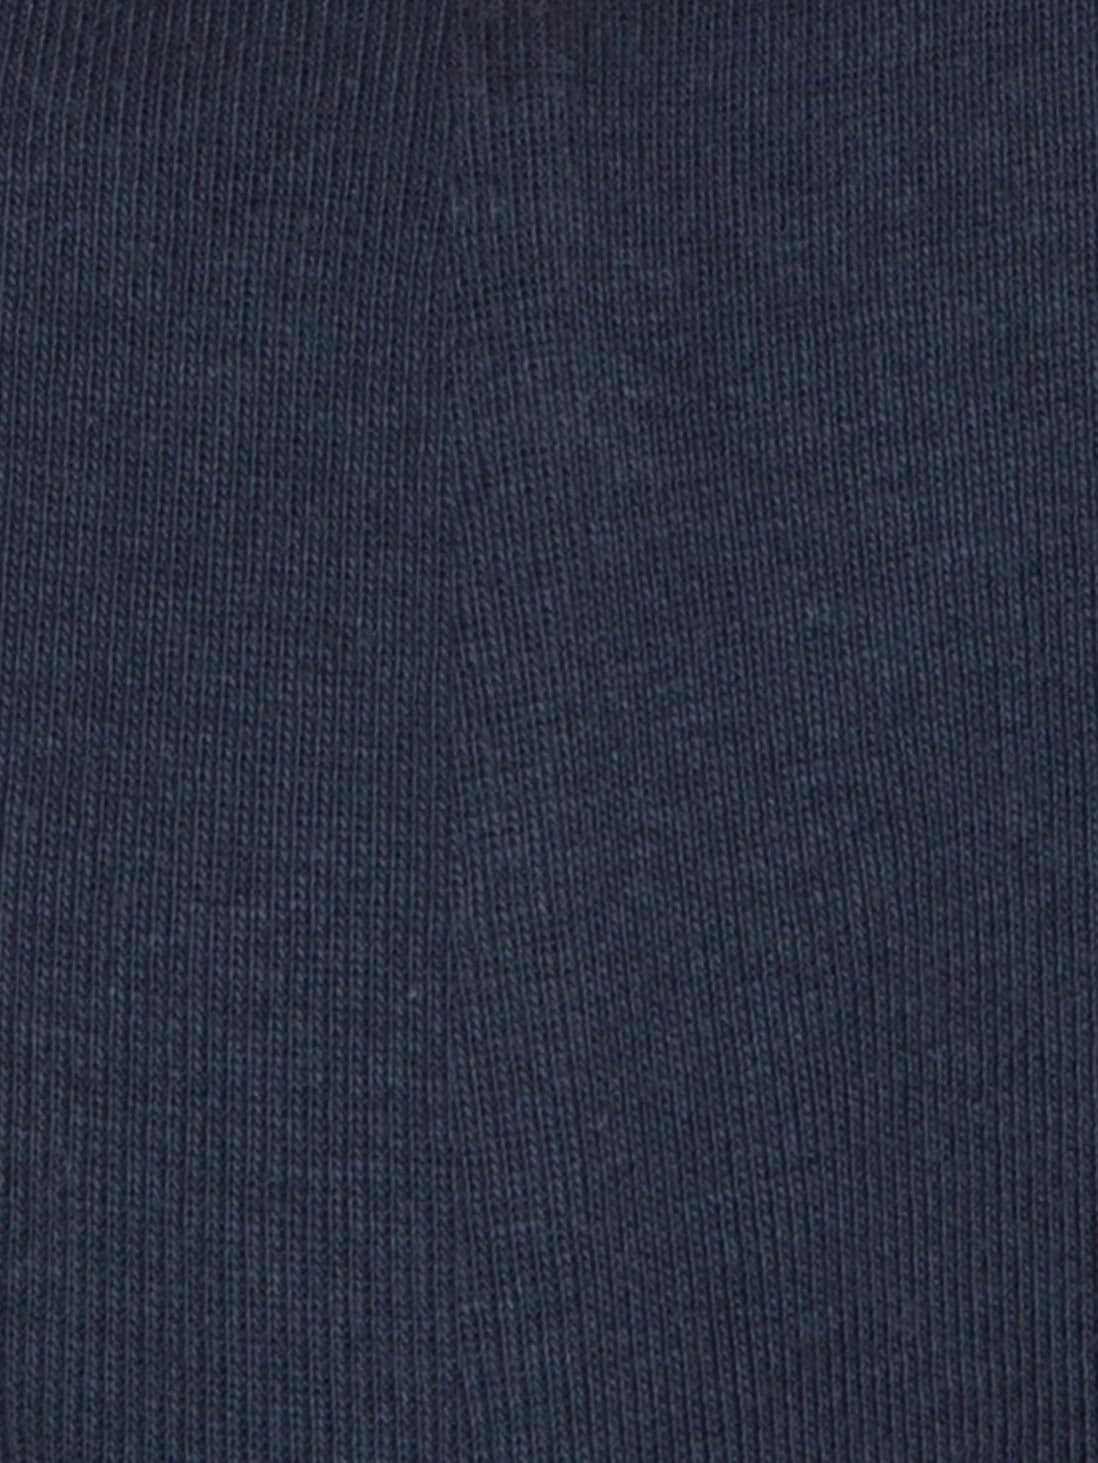 Jockey Modern Brief (Pack Of 2) (XL,Mid Blue)